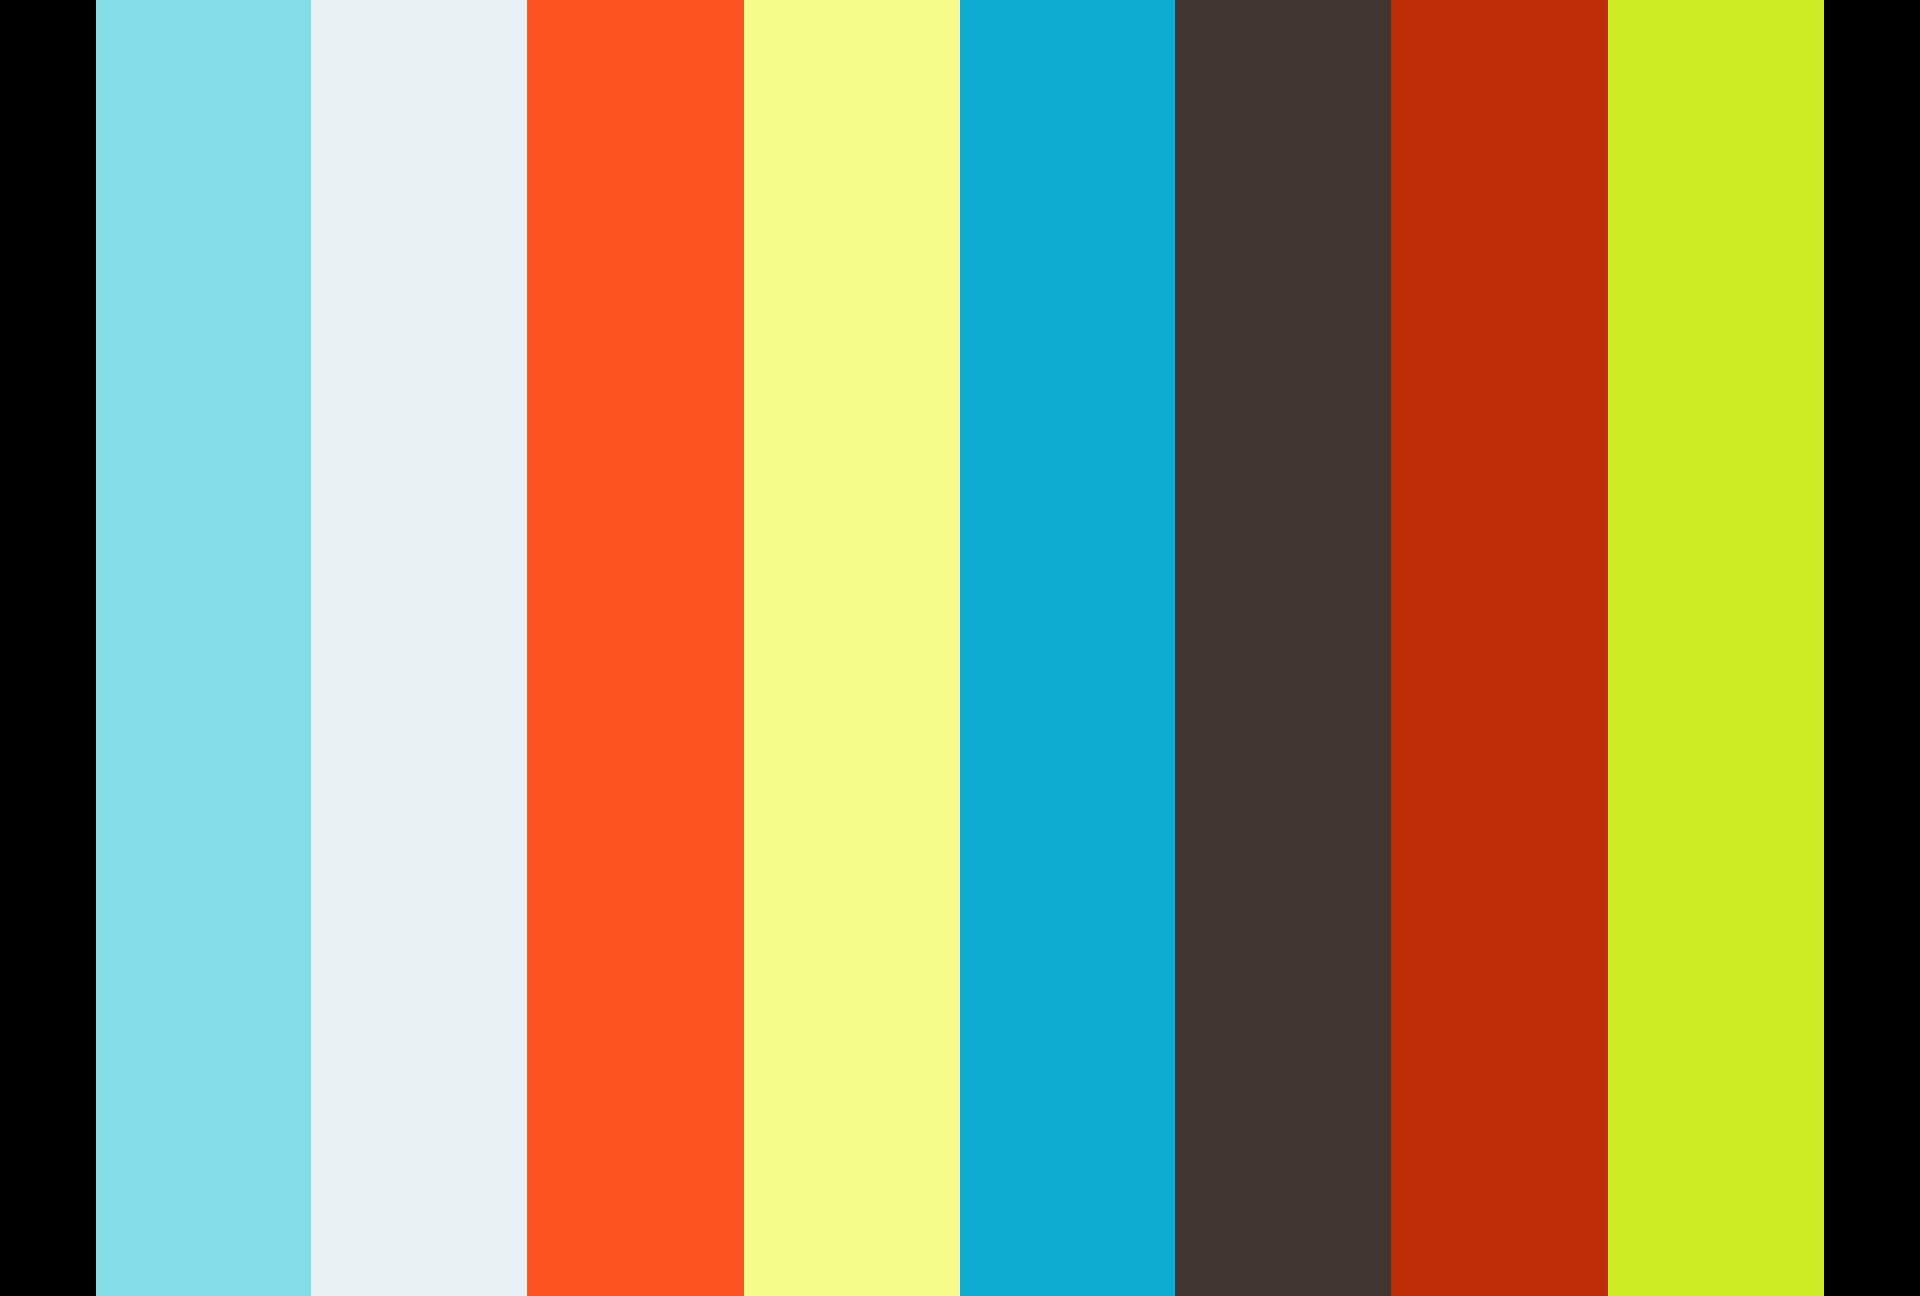 Vidéo Spot Internet BlaBlaCar - Ambassadeur - VO Damien Hartmann